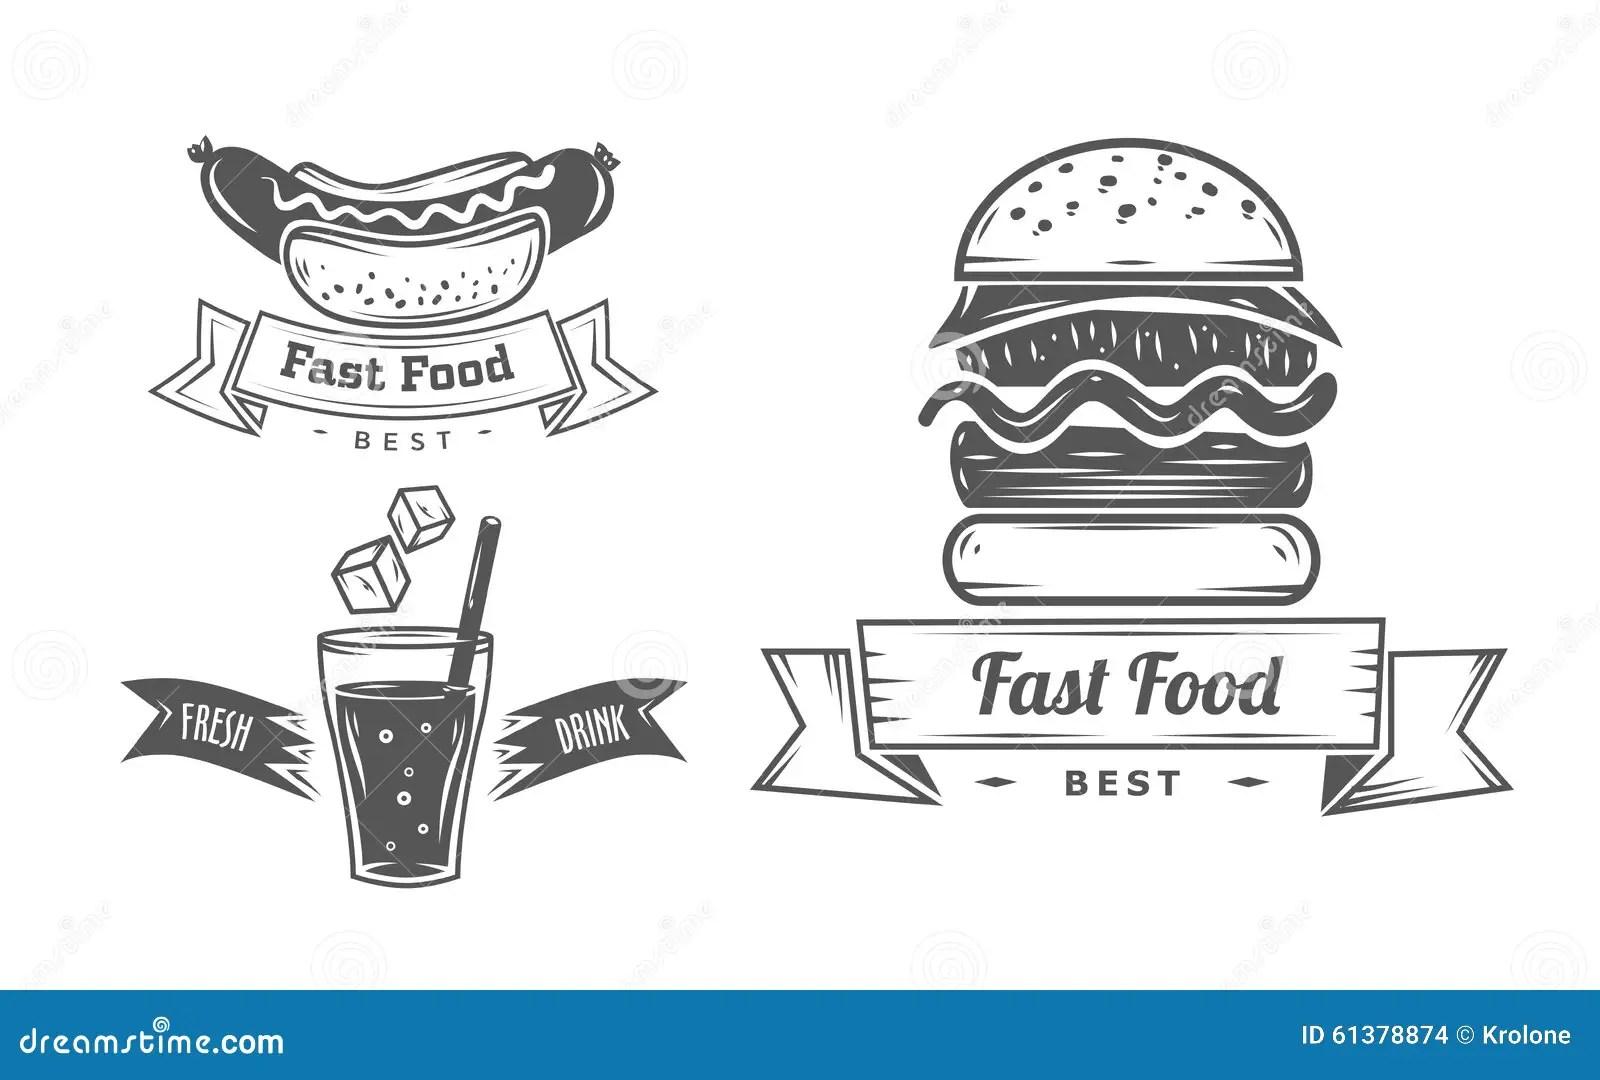 Burger Menu Restaurant Badges Fast Food Design Template